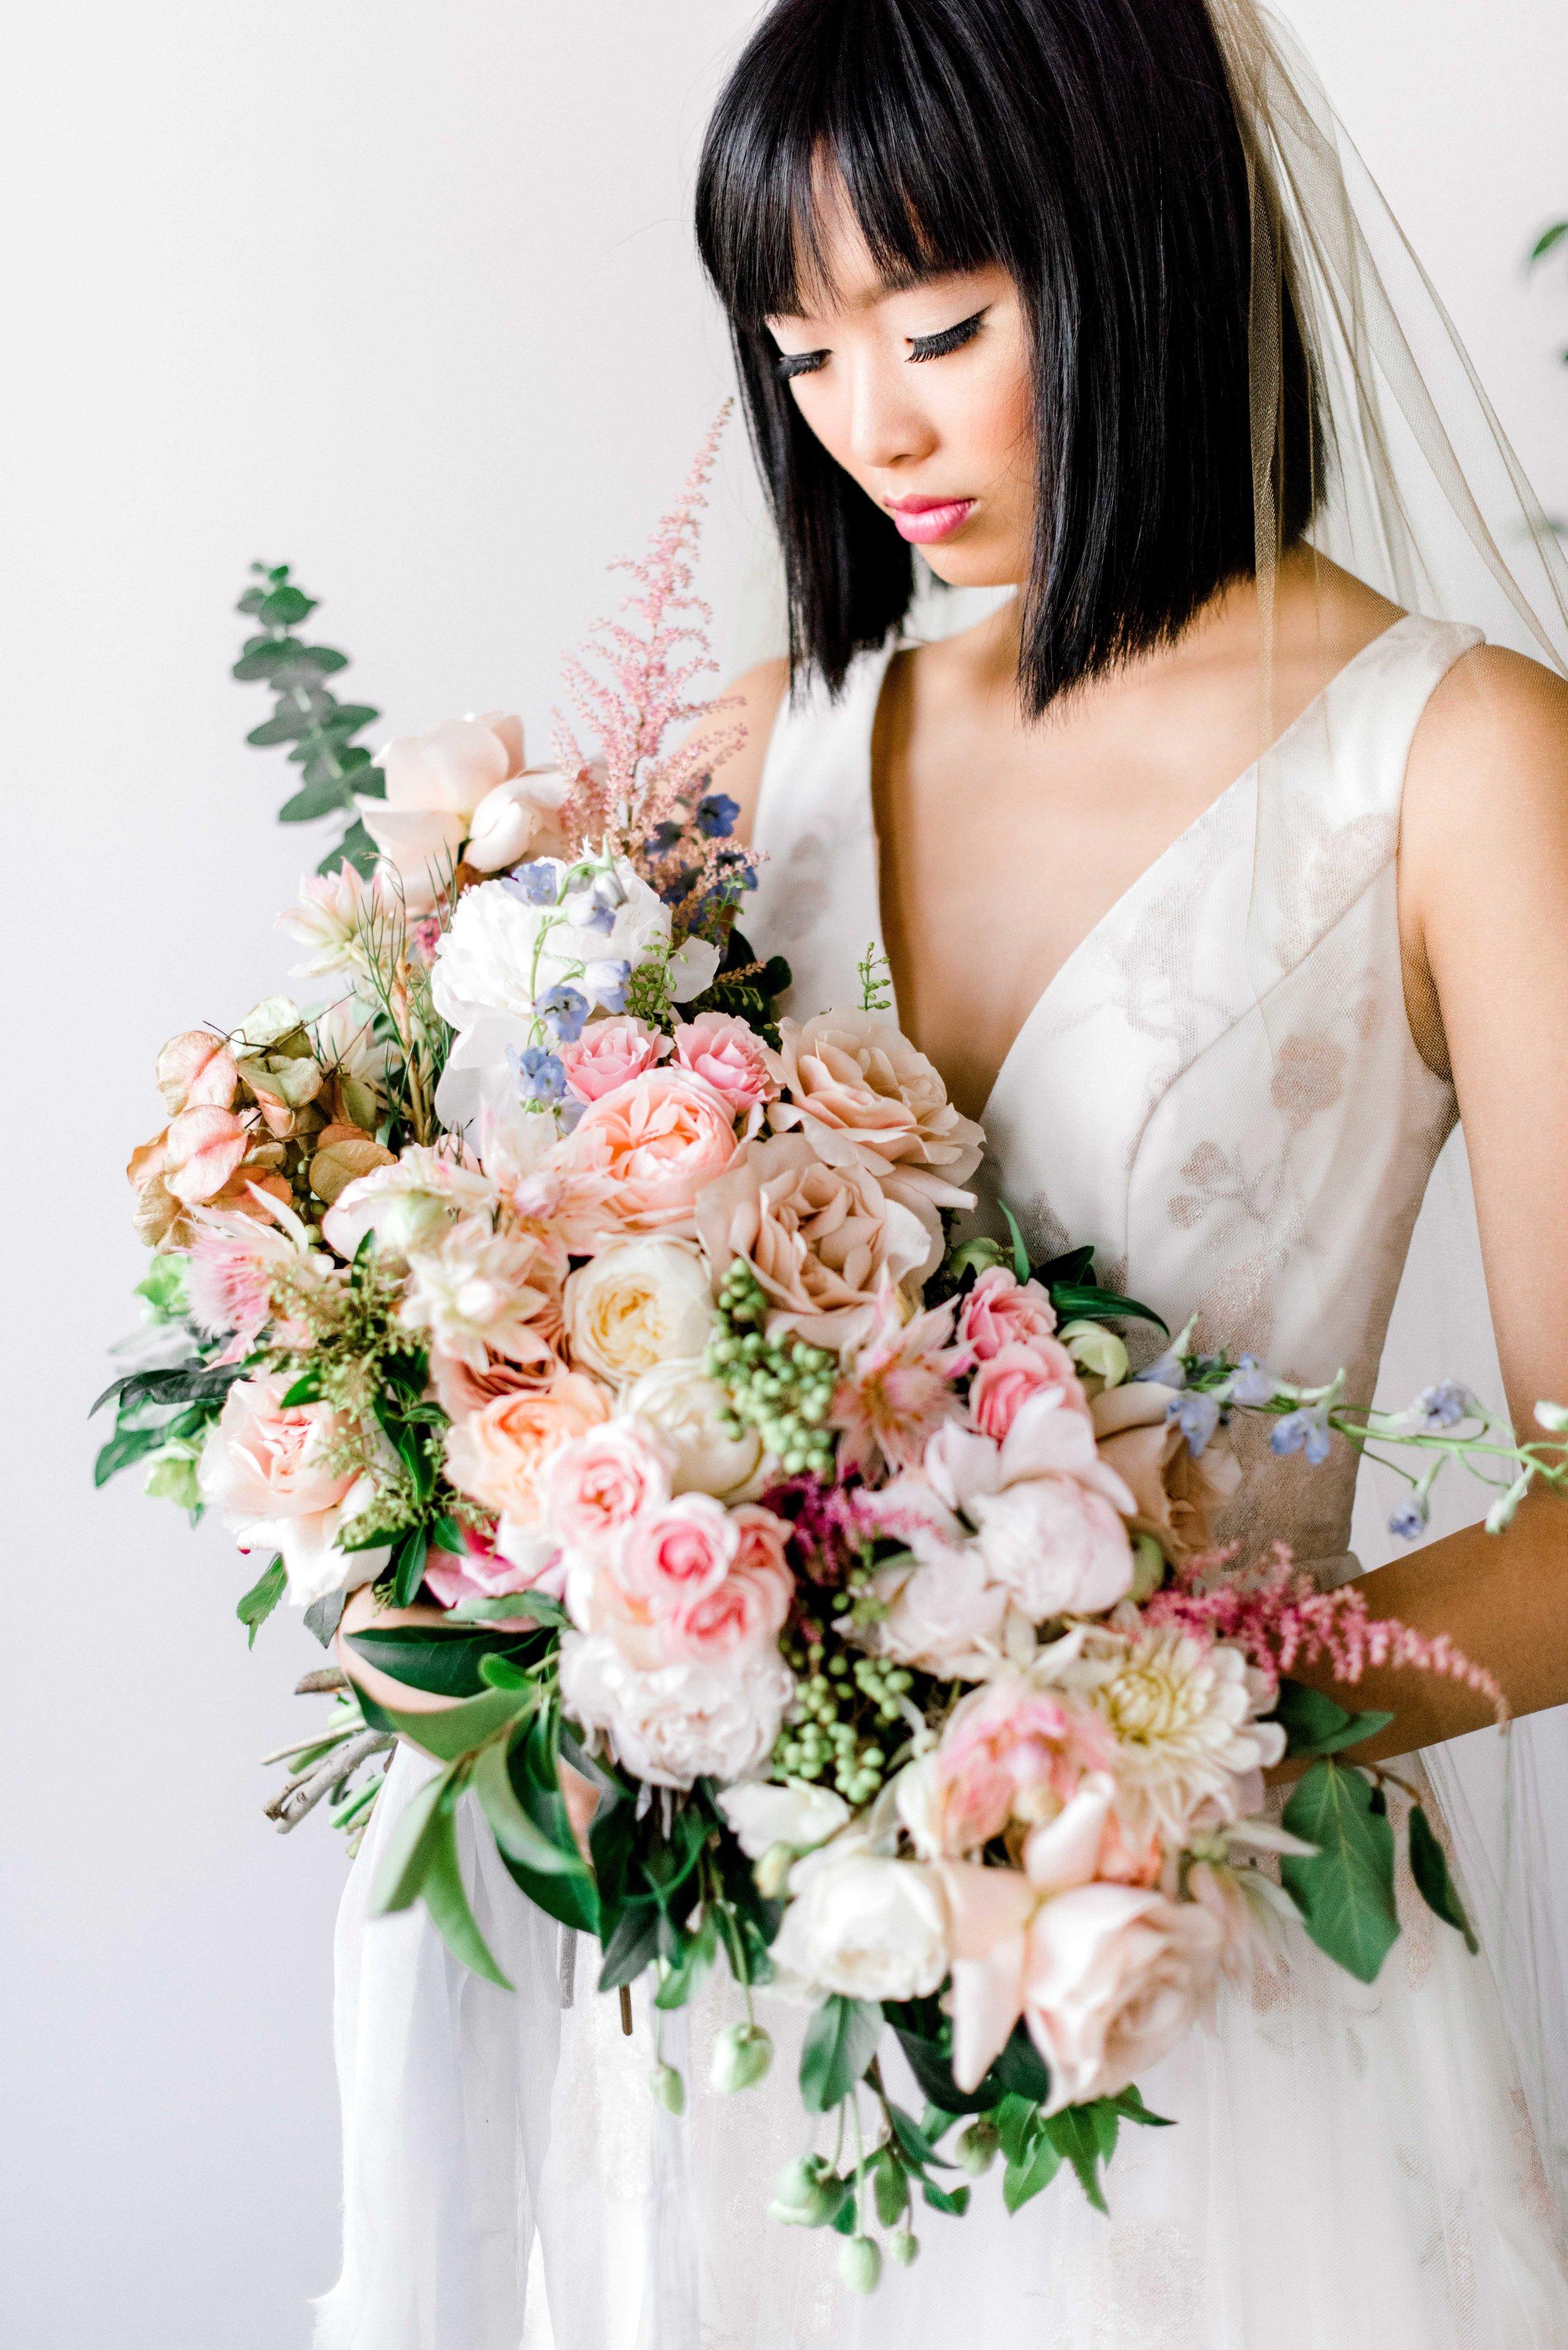 Houston-Wedding-Photographer-Editorial-Fine-Art-Film-Destination-Dallas-Texas-Mibellarosa-Josh-Dana-Fernandez-Photography-24.jpg